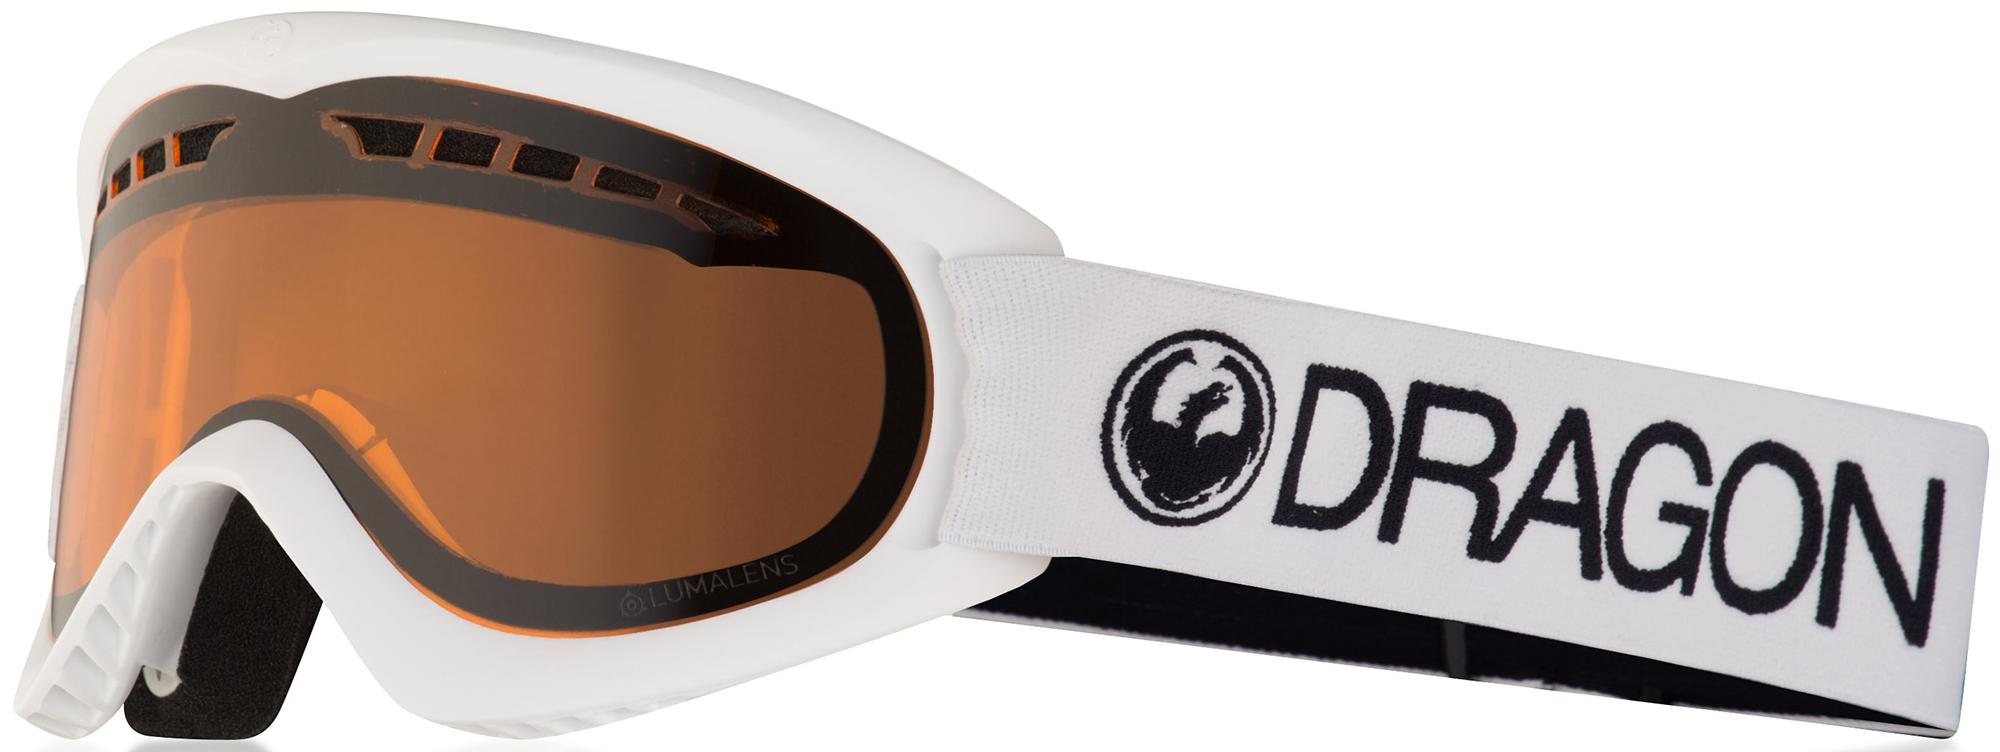 Dragon Маска Dragon Dx White - Lumalens